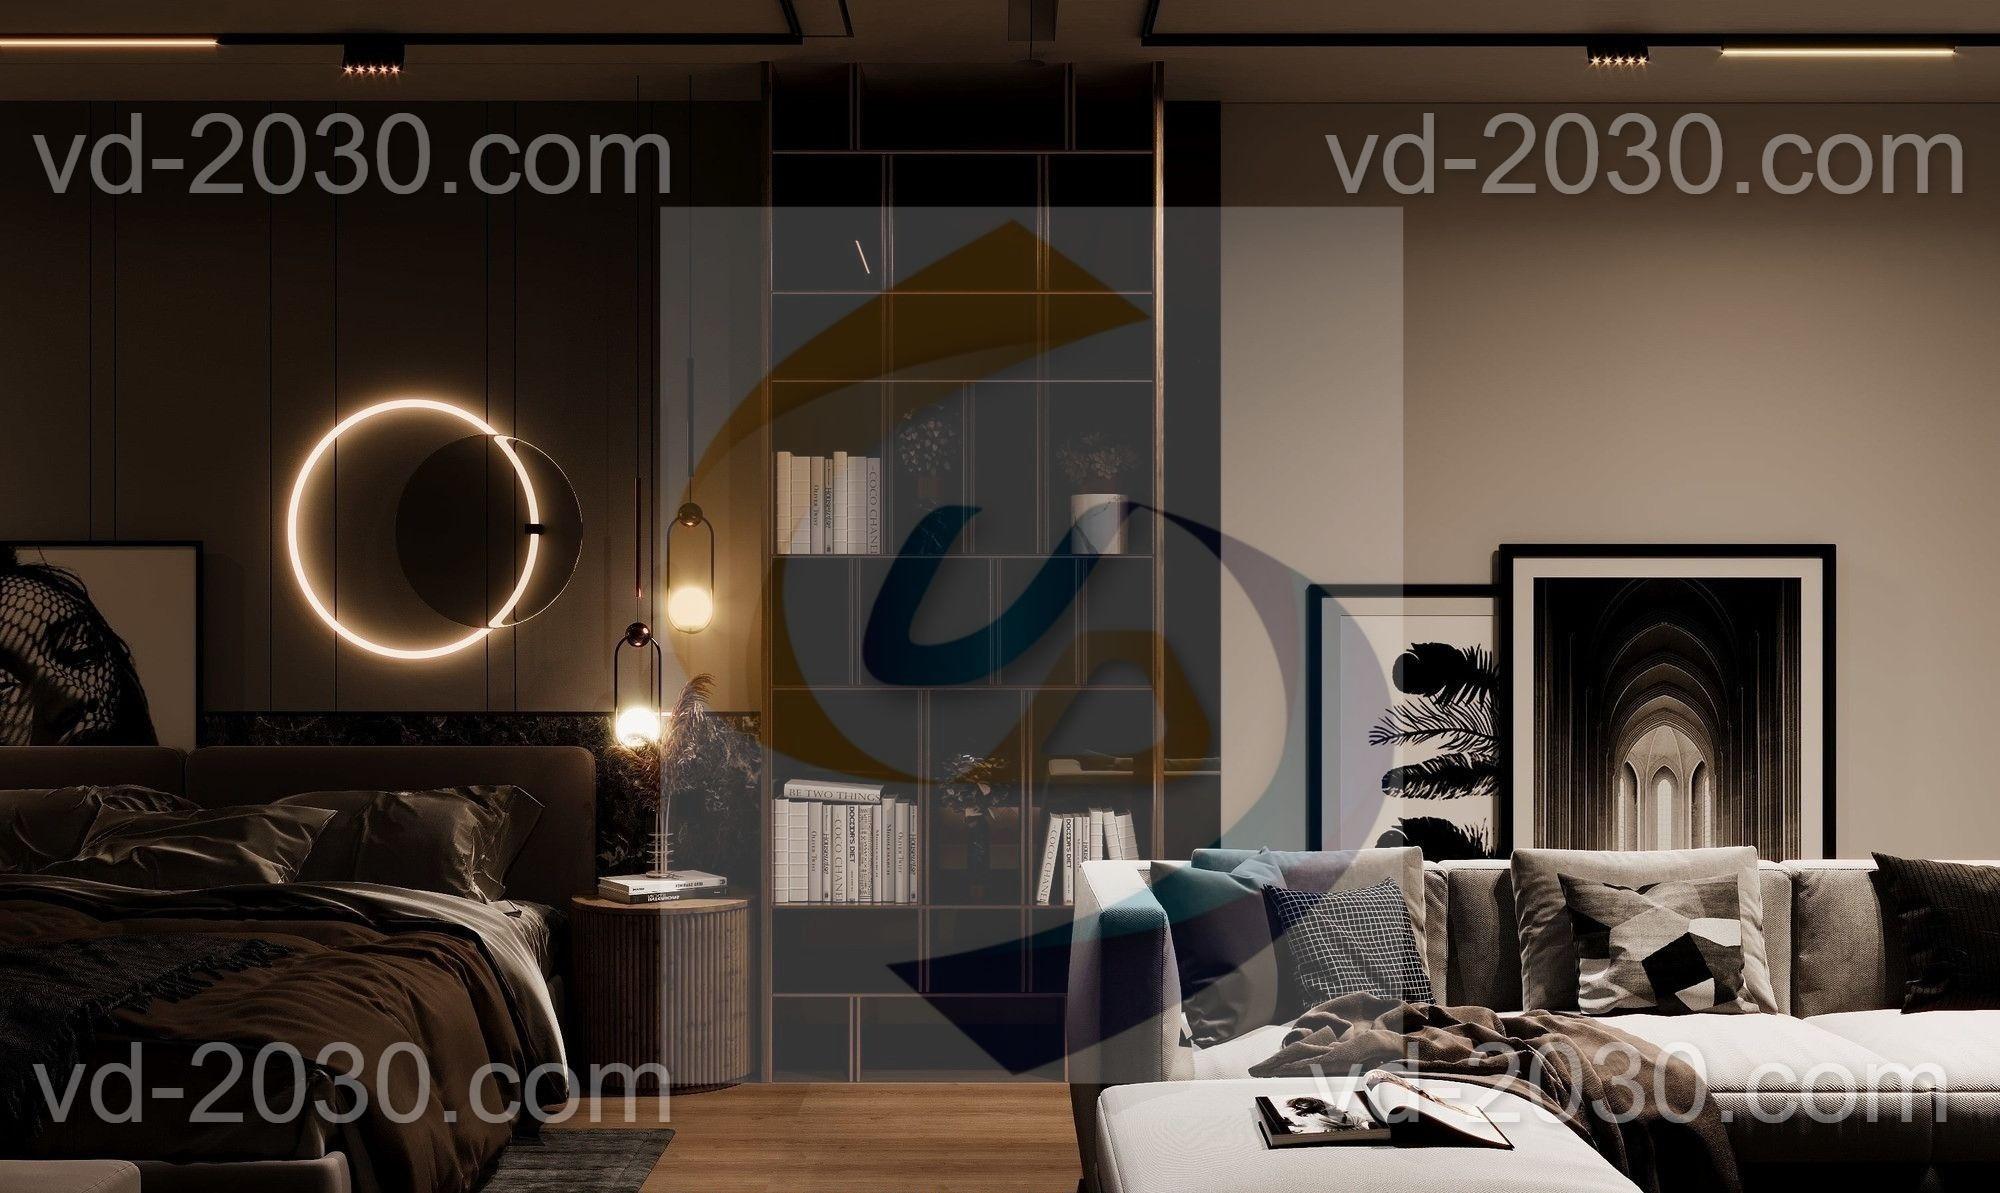 Al-Ghamdi project bedroom- vision dimensions - ابعاد الرؤية